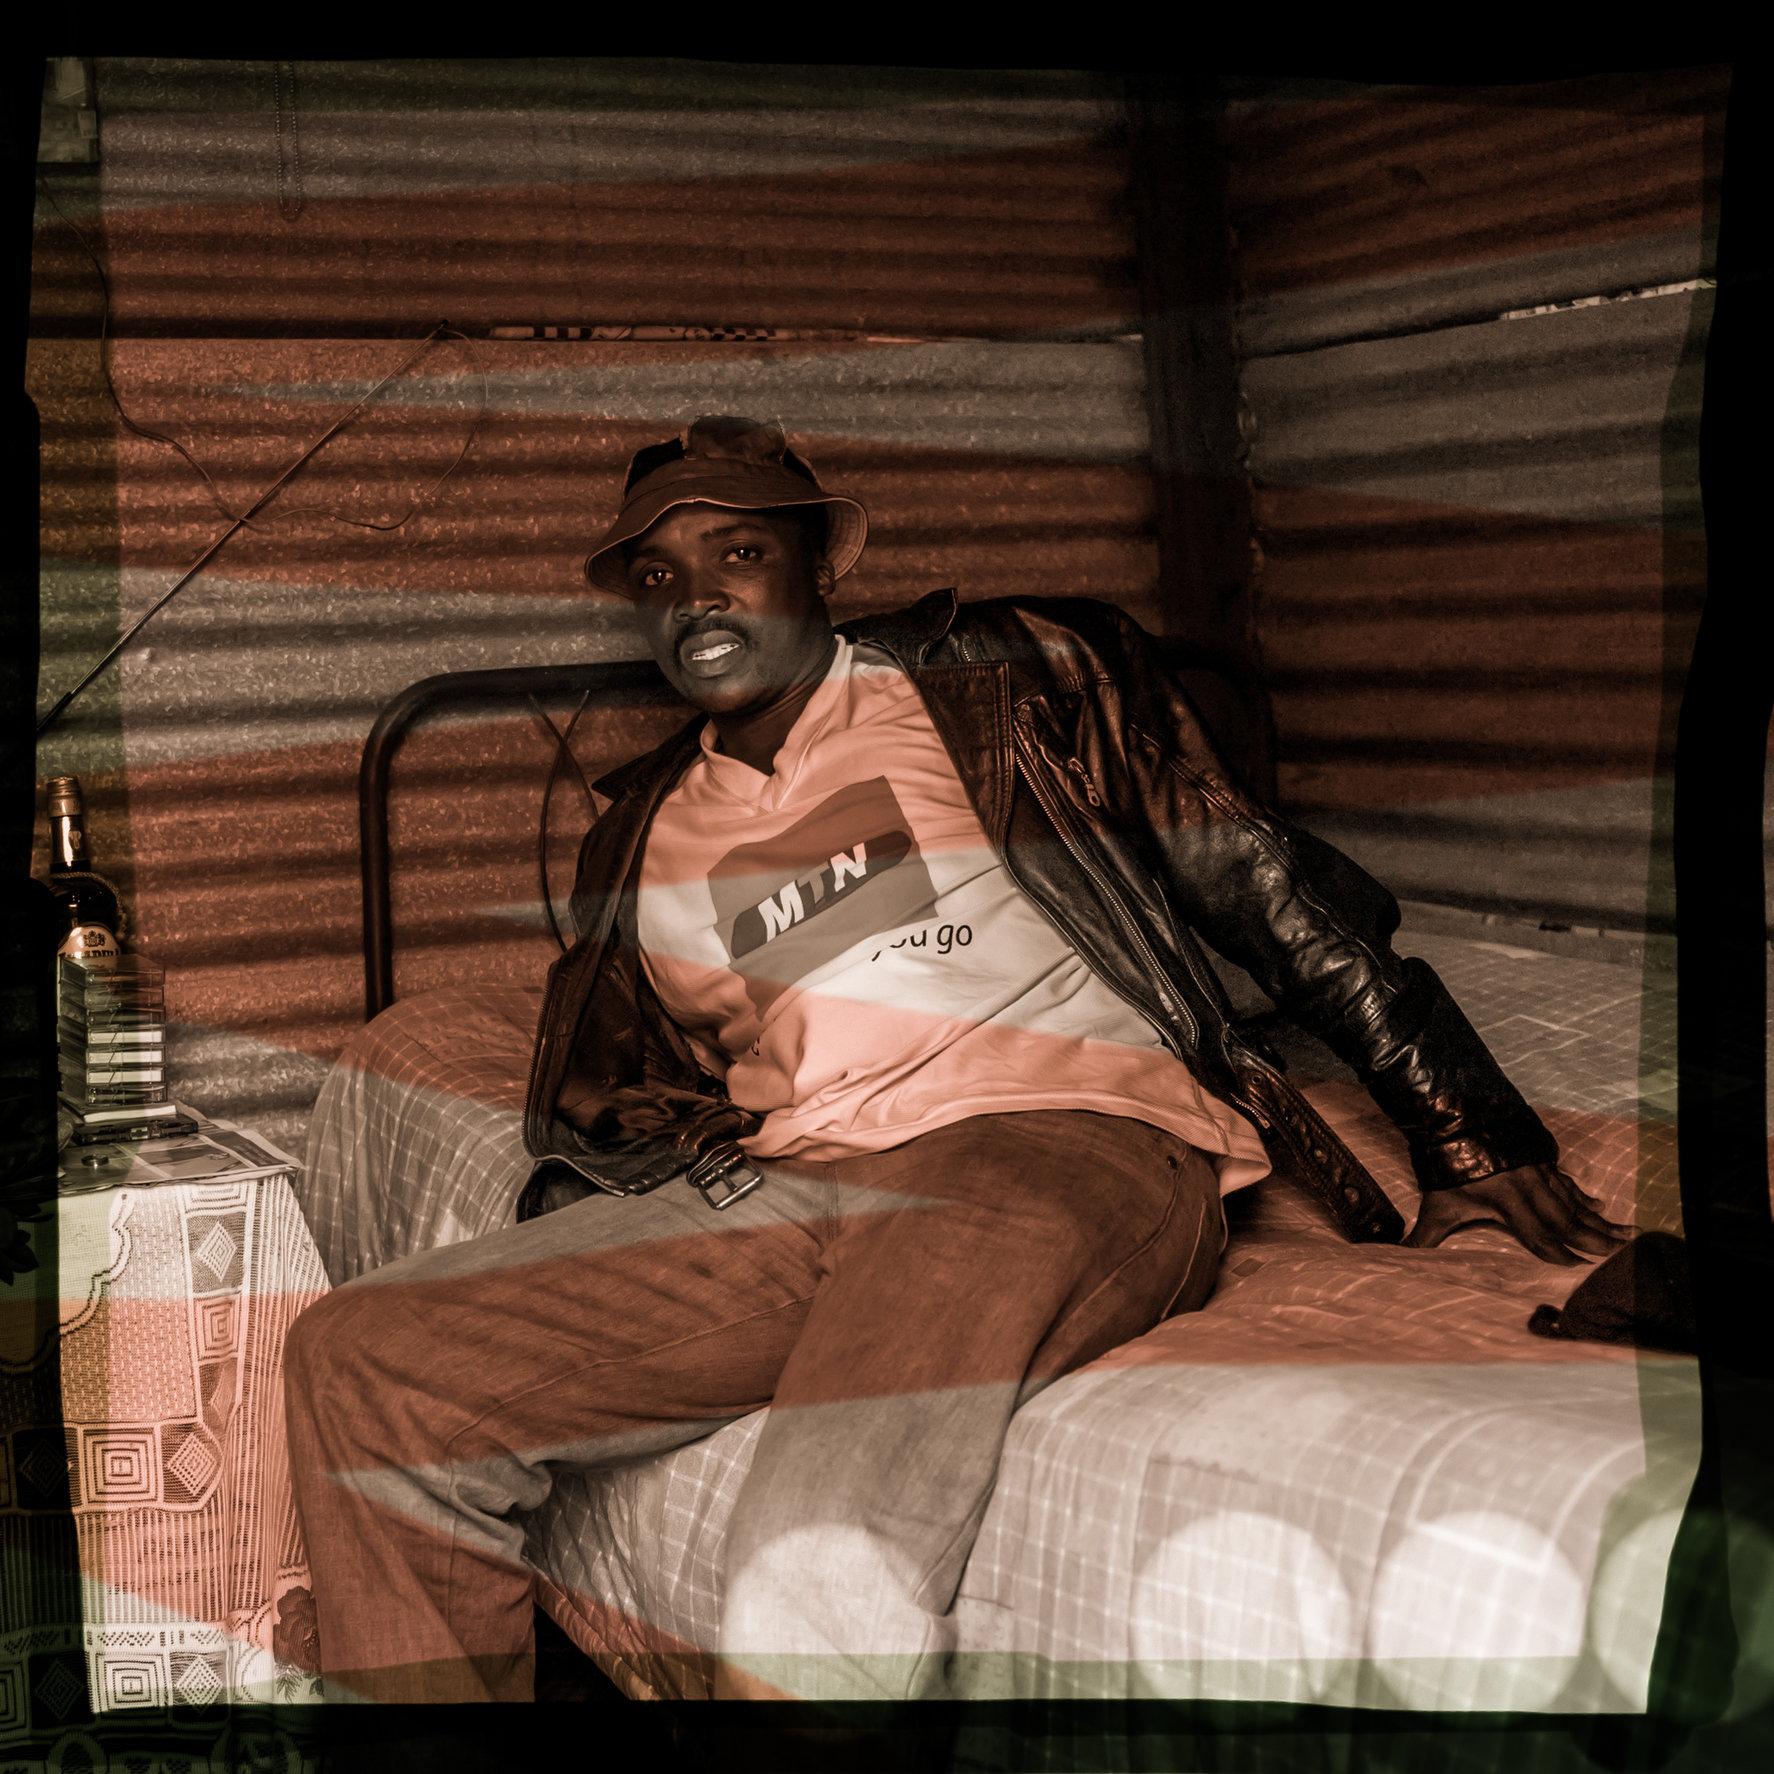 Soweto_scared_man-L1003905.jpg